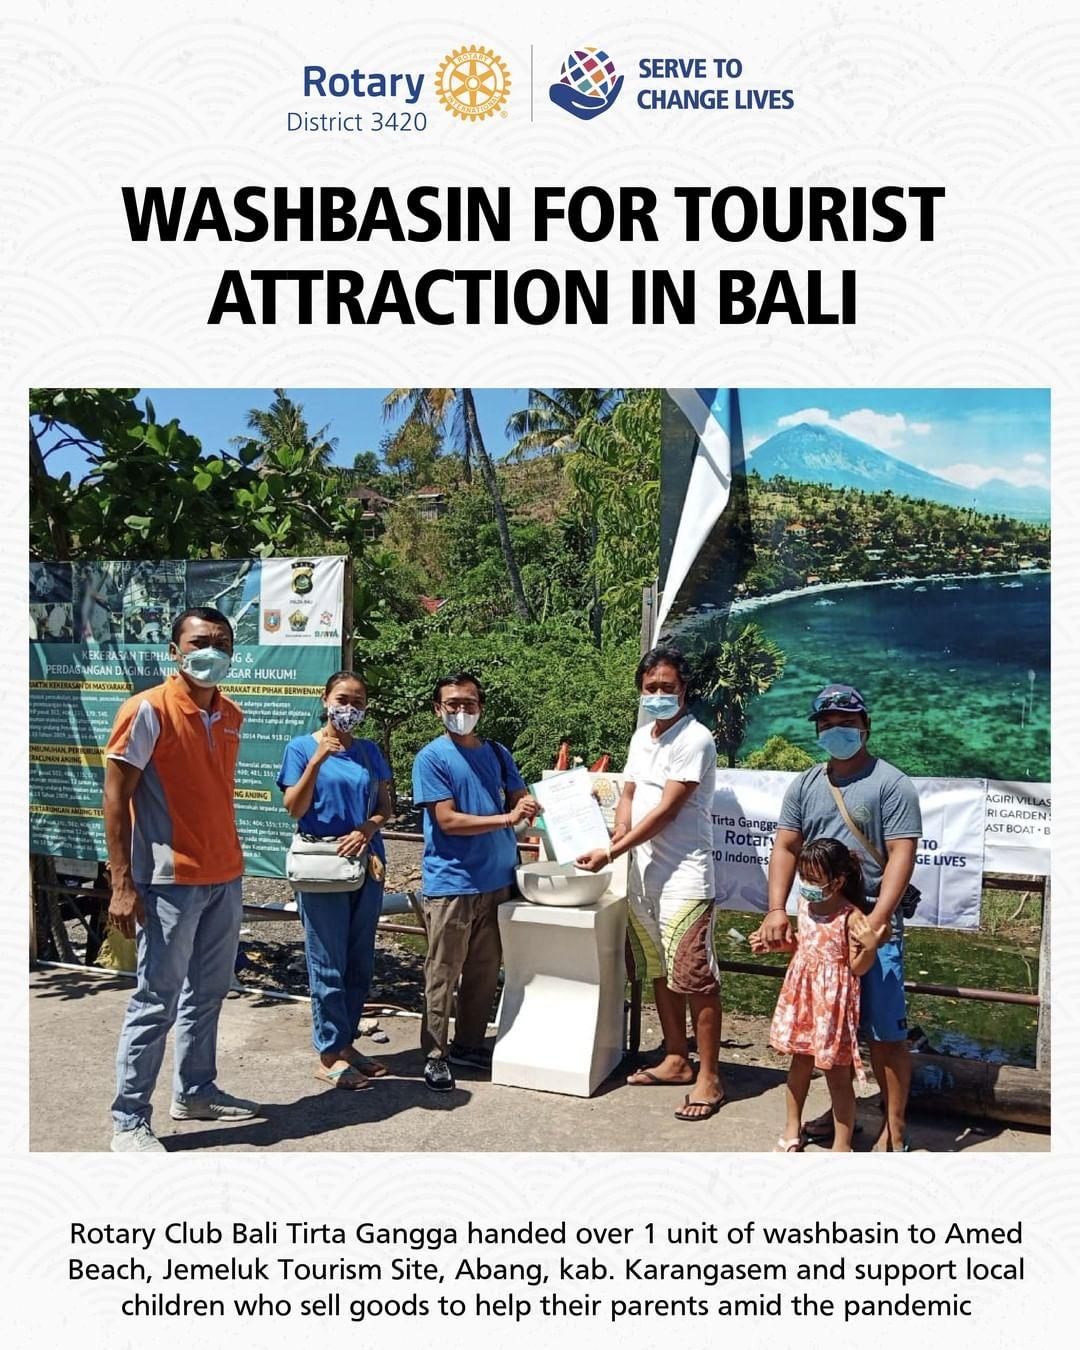 Washbasin for Tourist Attraction in Bali